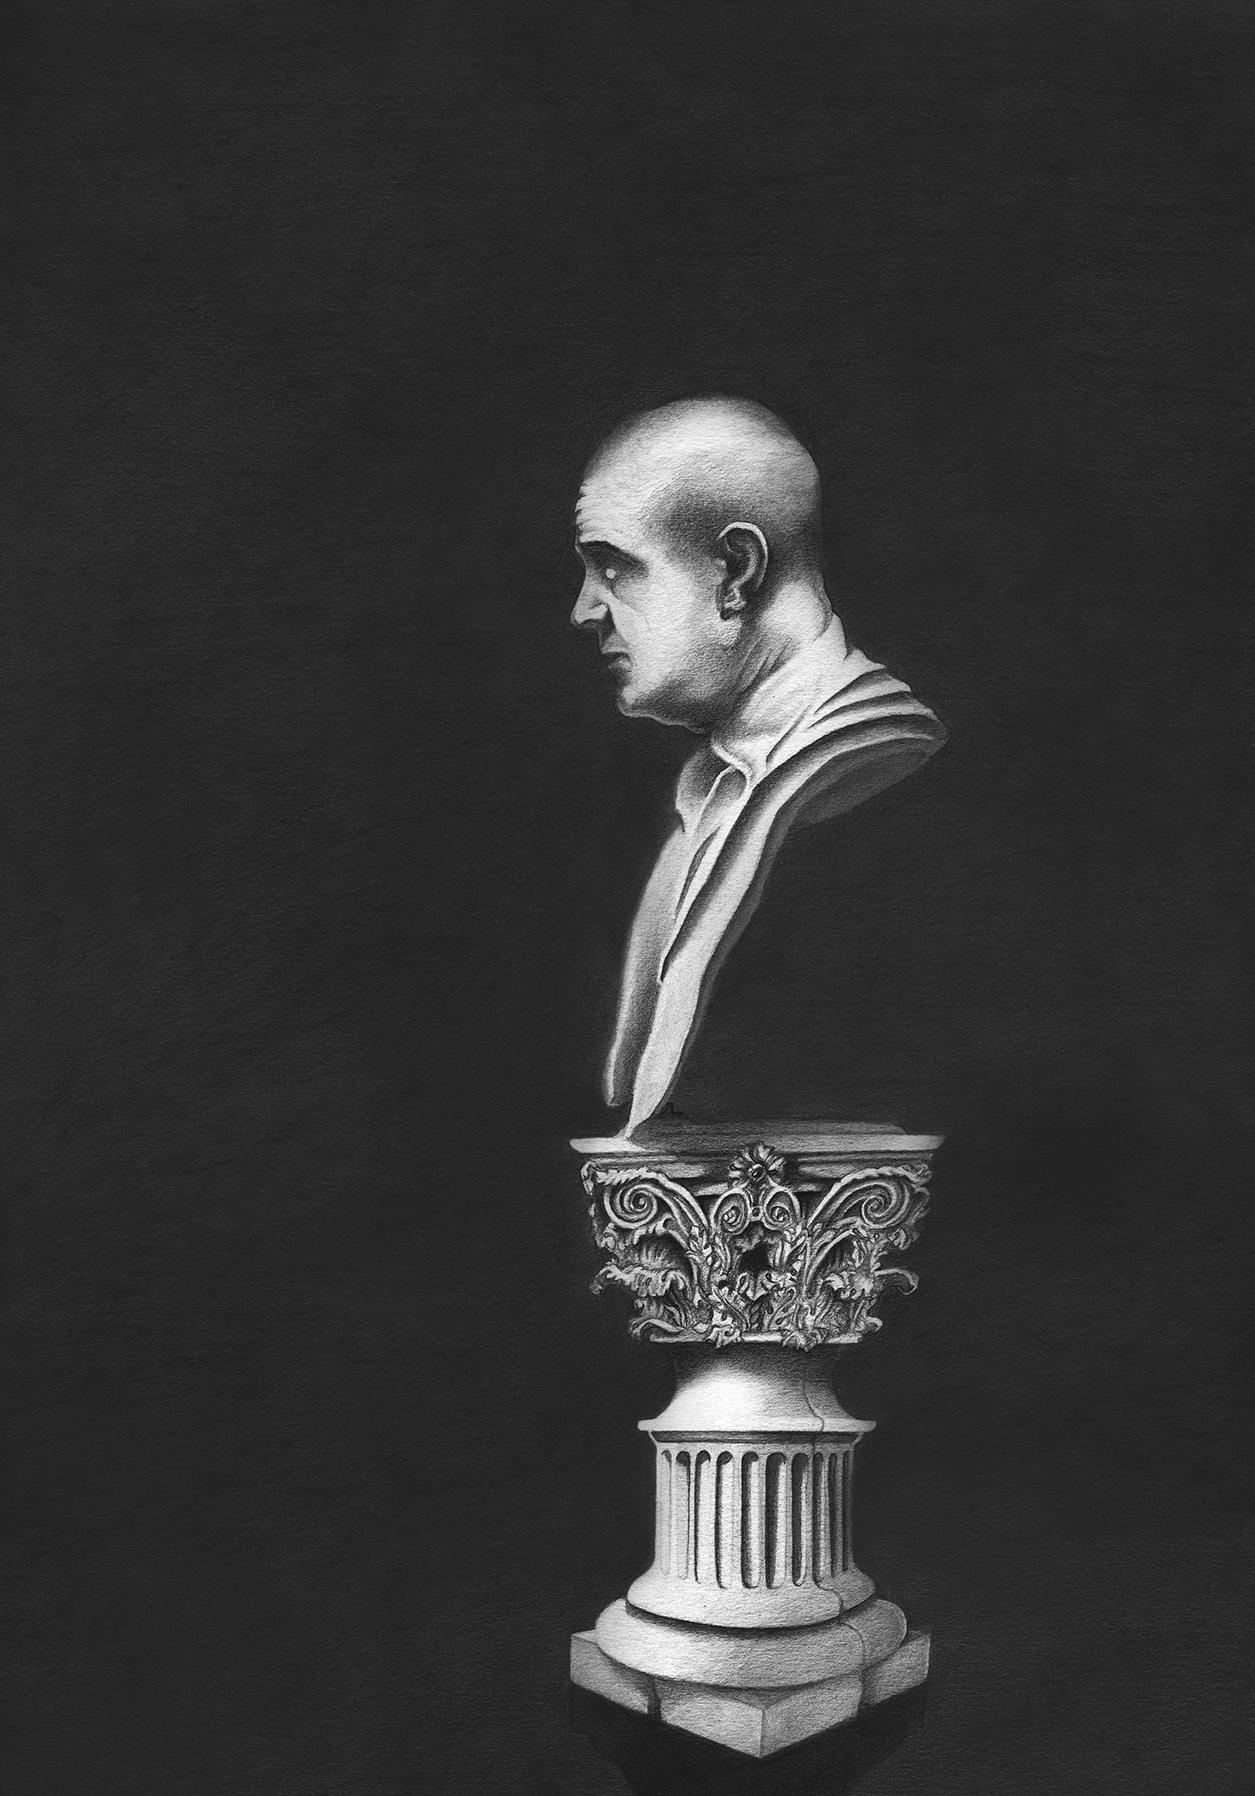 Den Siste Kejsaren / The Last Emperor